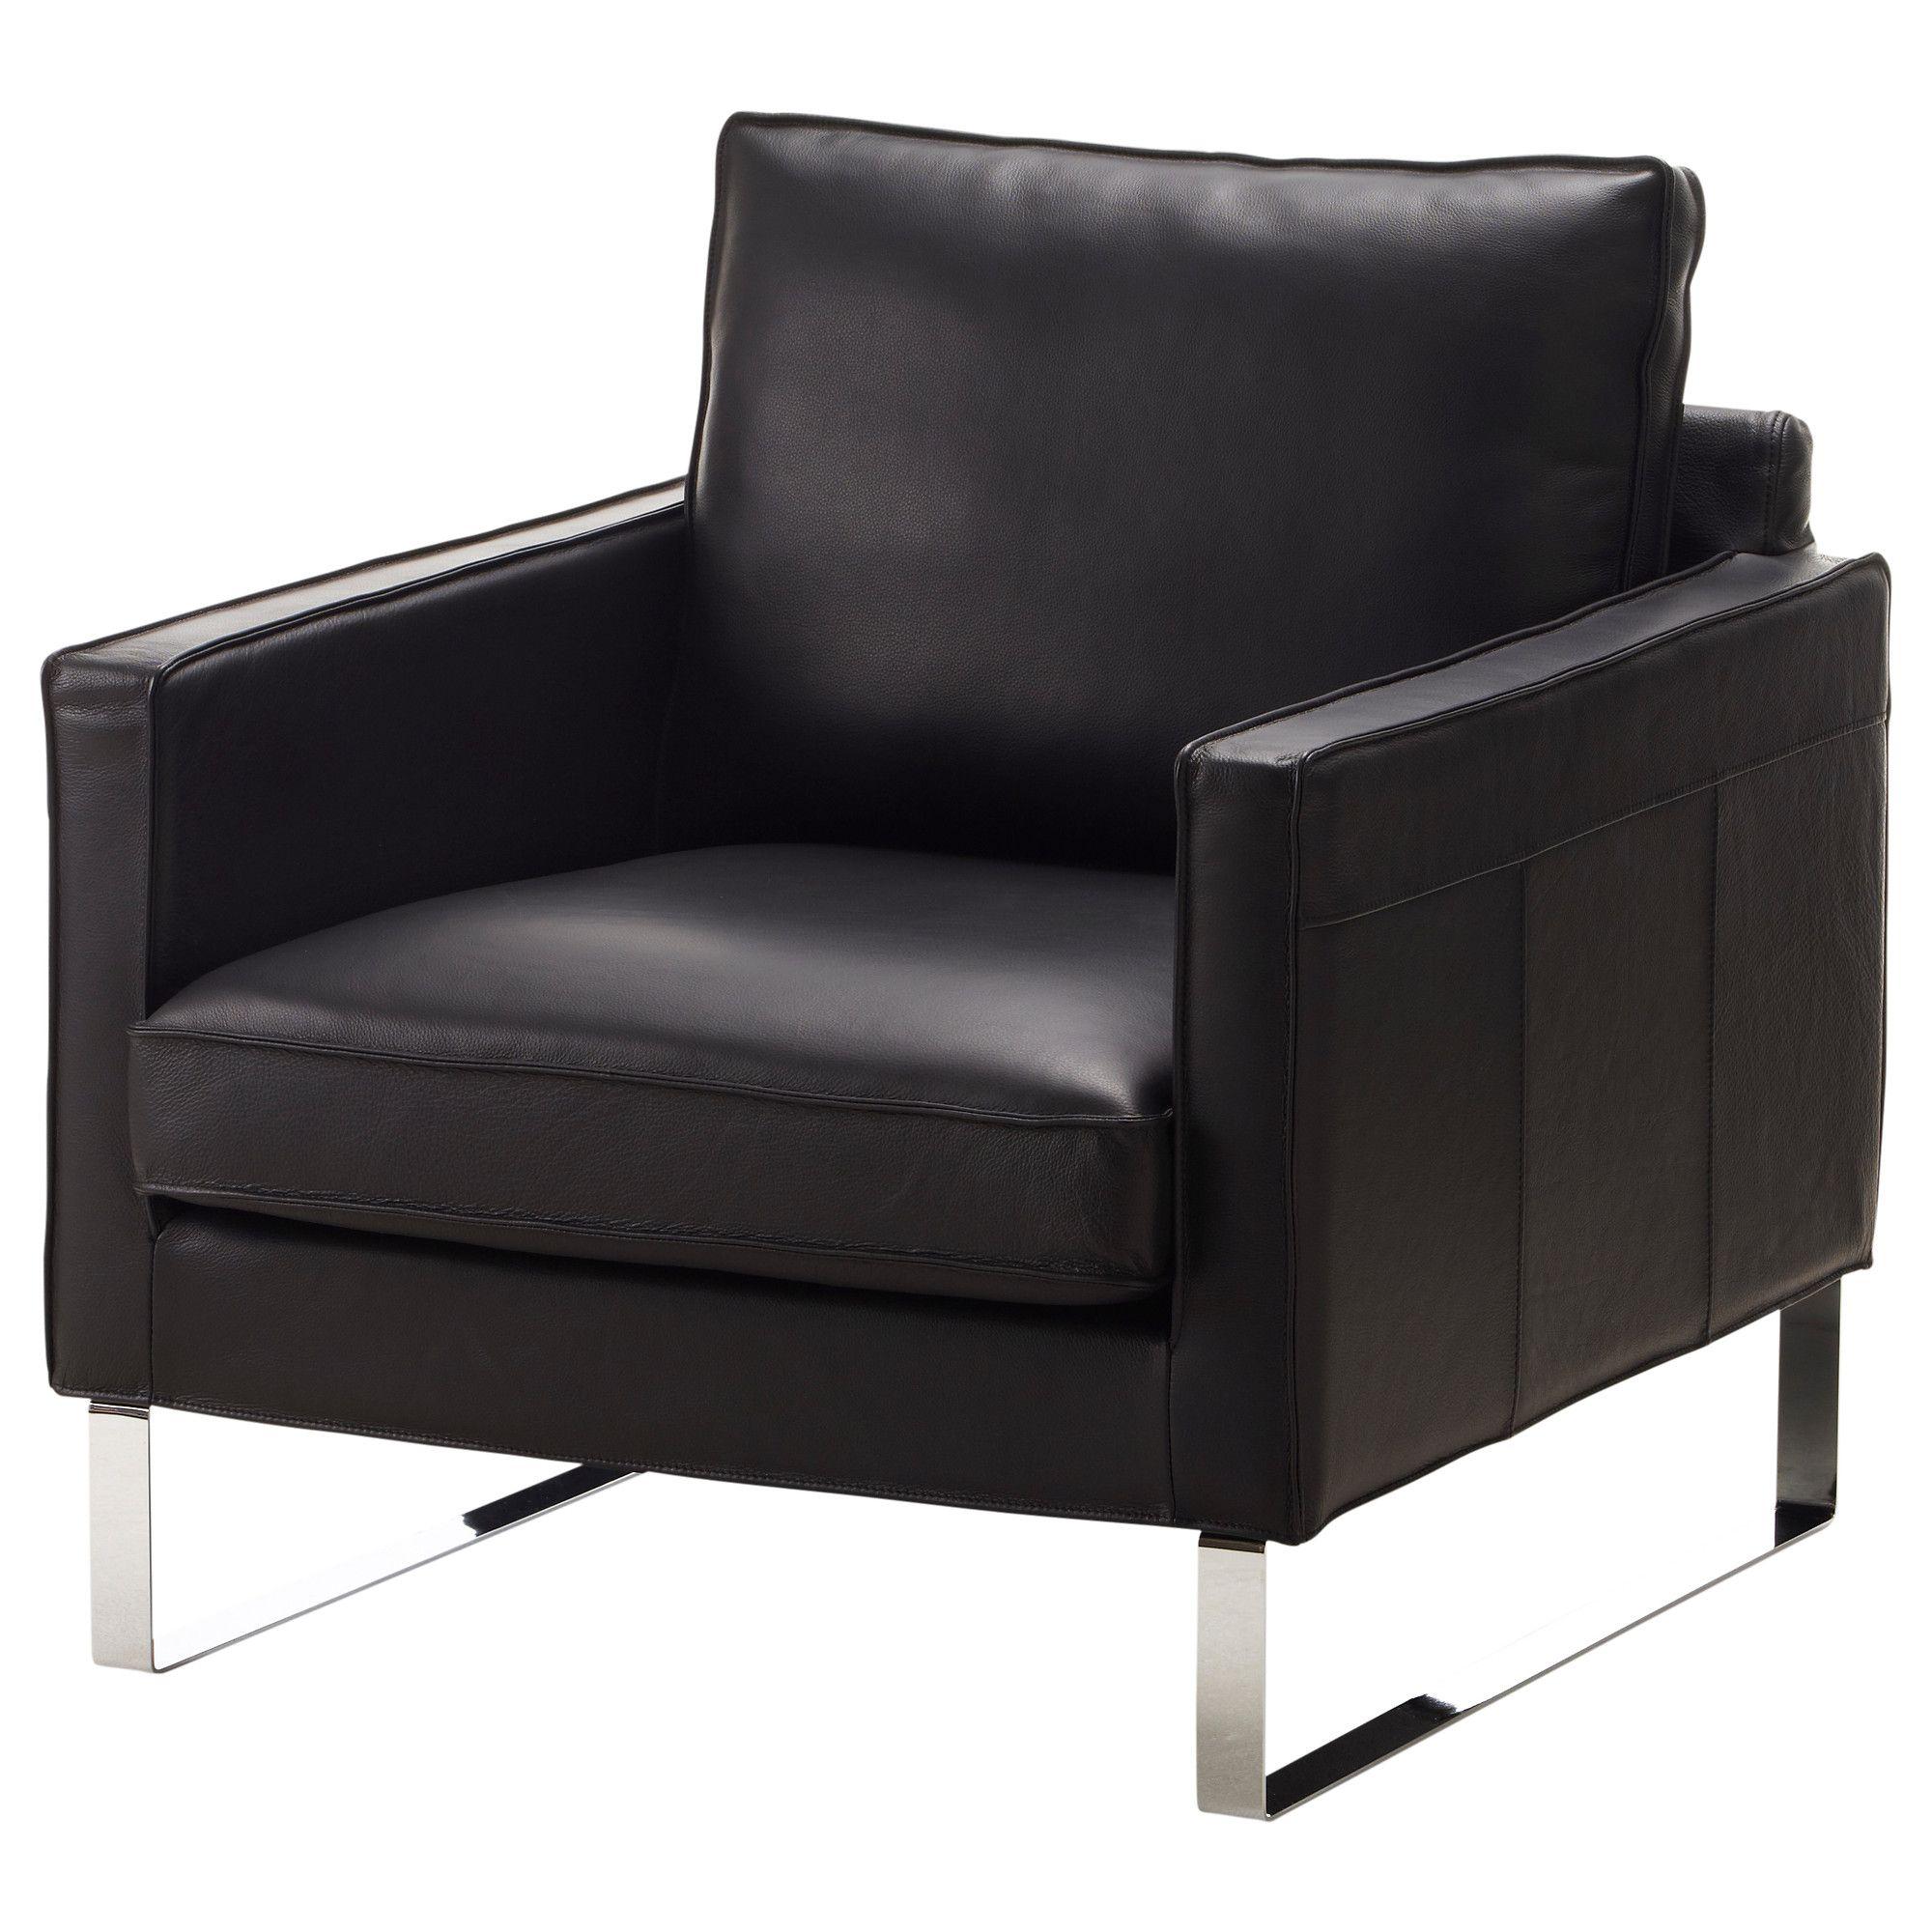 US Furniture and Home Furnishings Ikea armchair